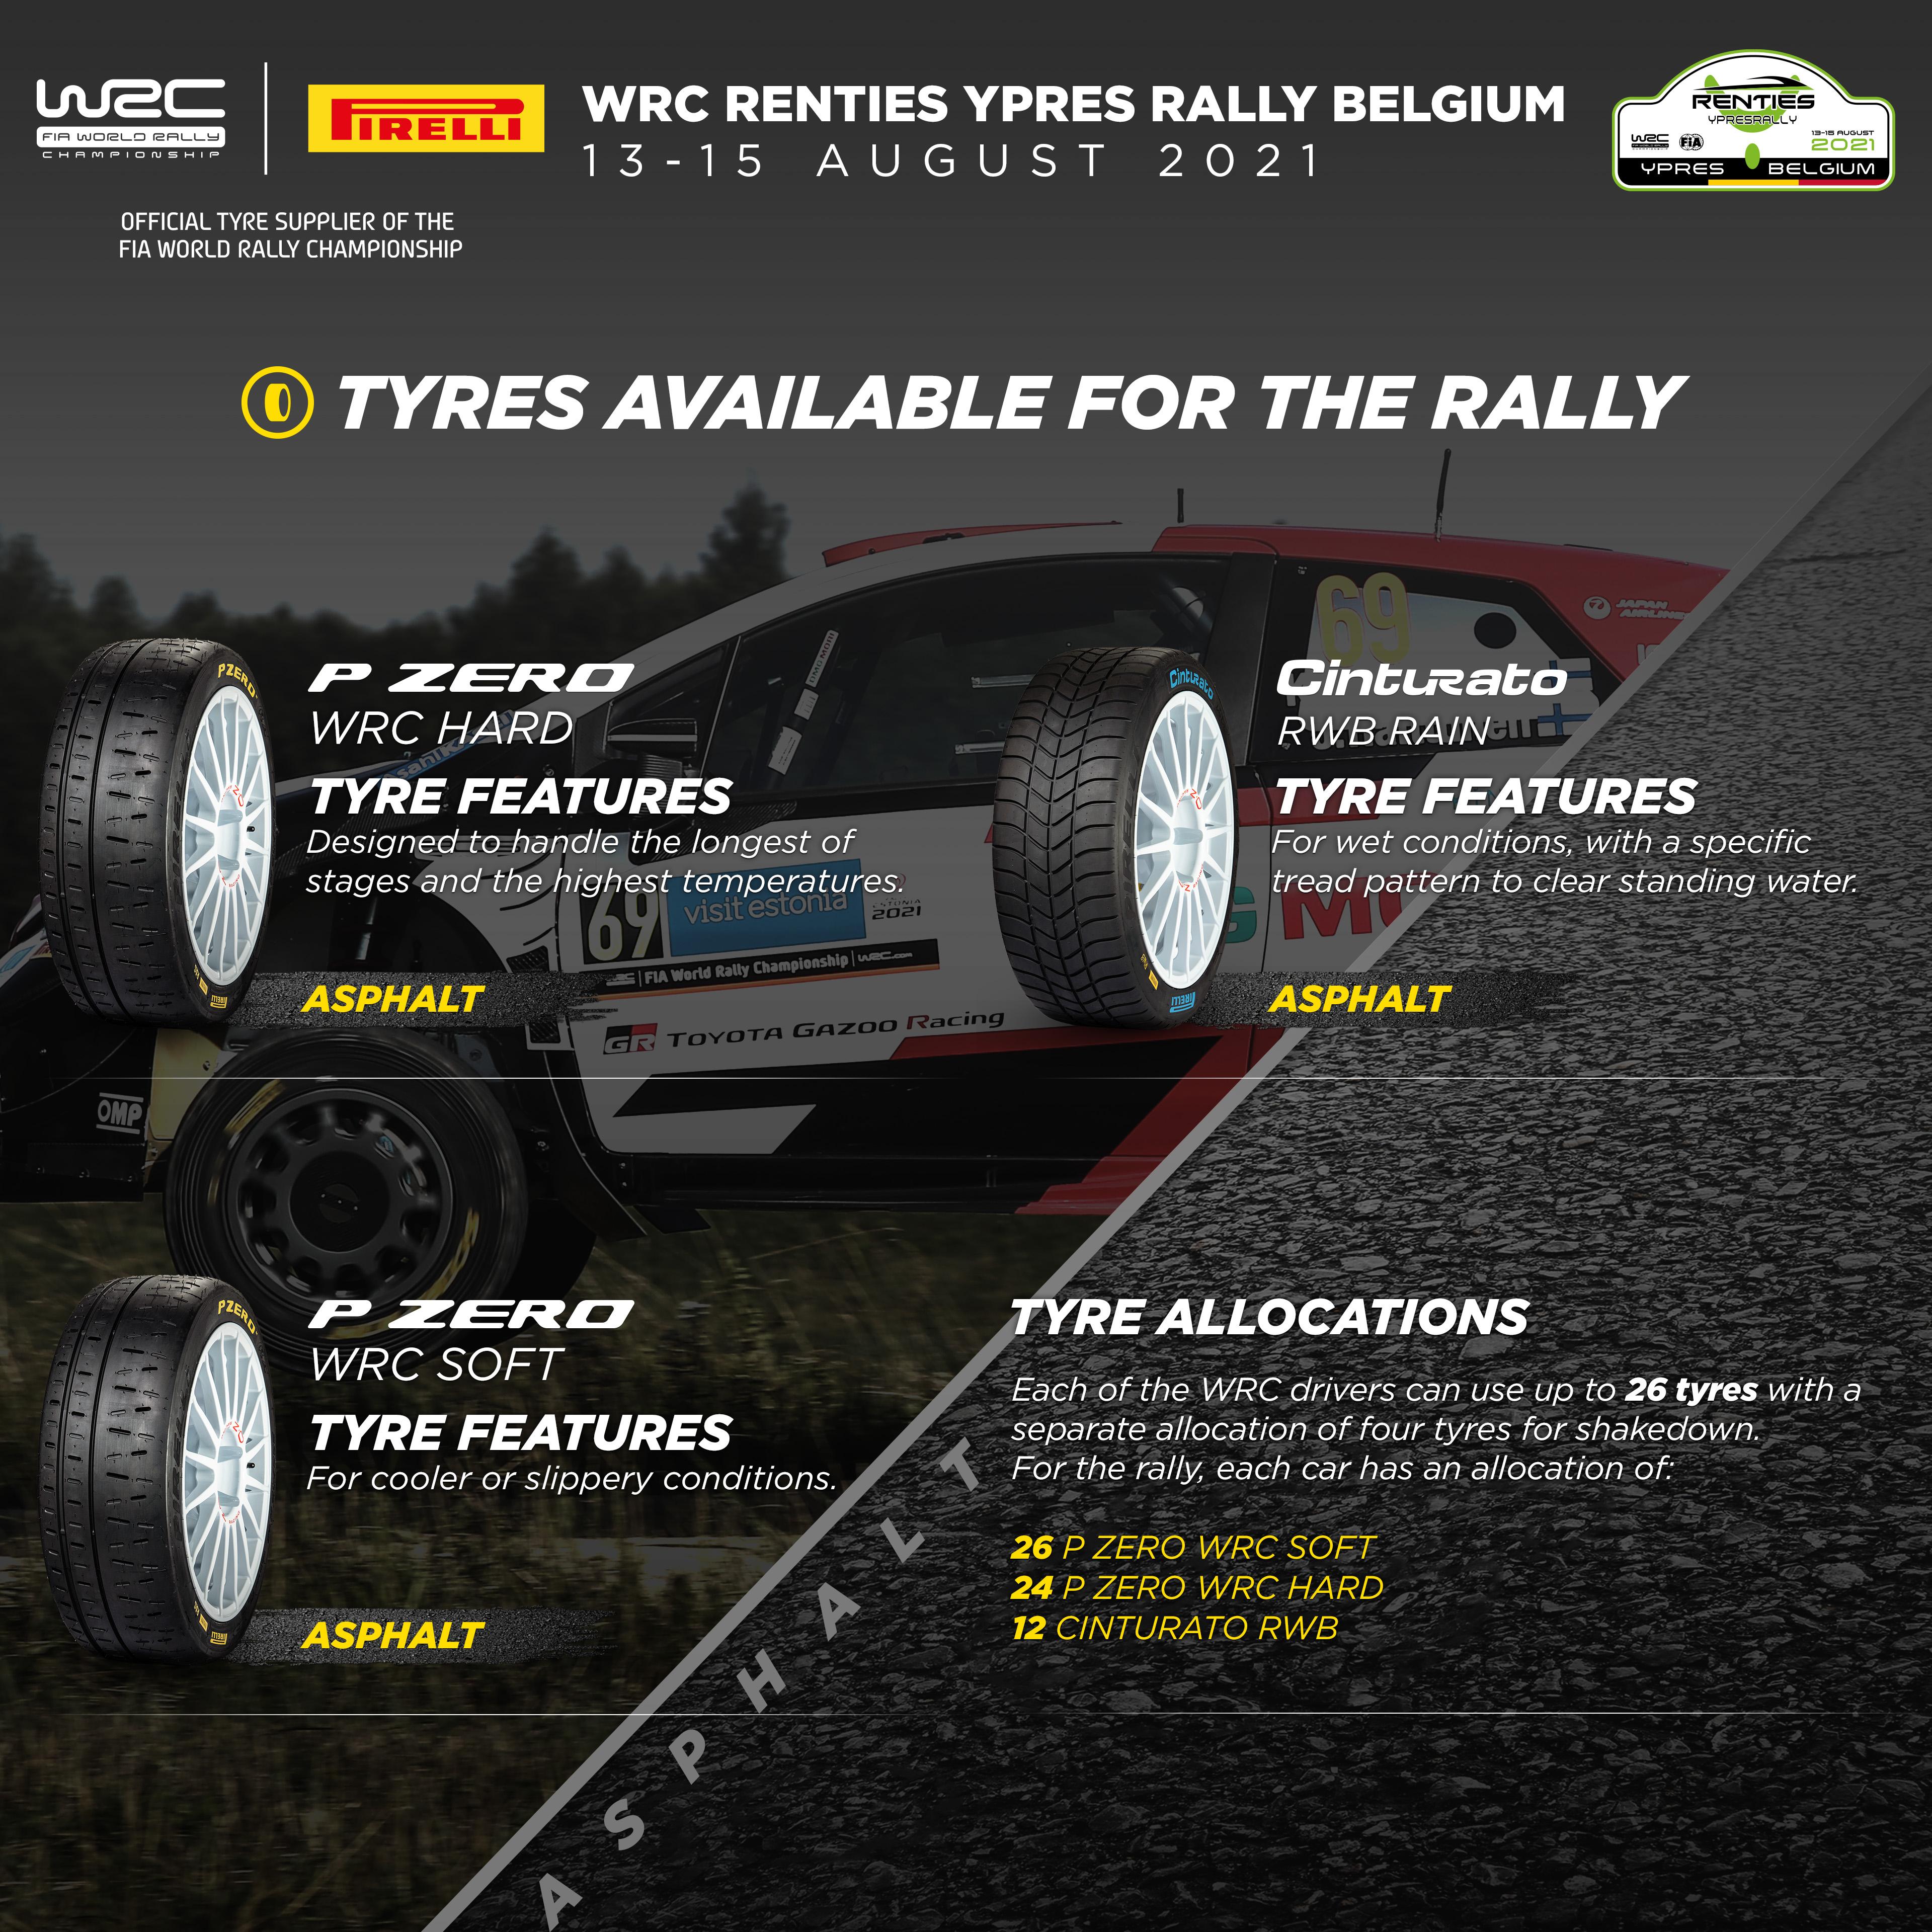 WRC: RENTIES Ypres Rally [13-15 Agosto] - Página 2 Pirelli-Graphic